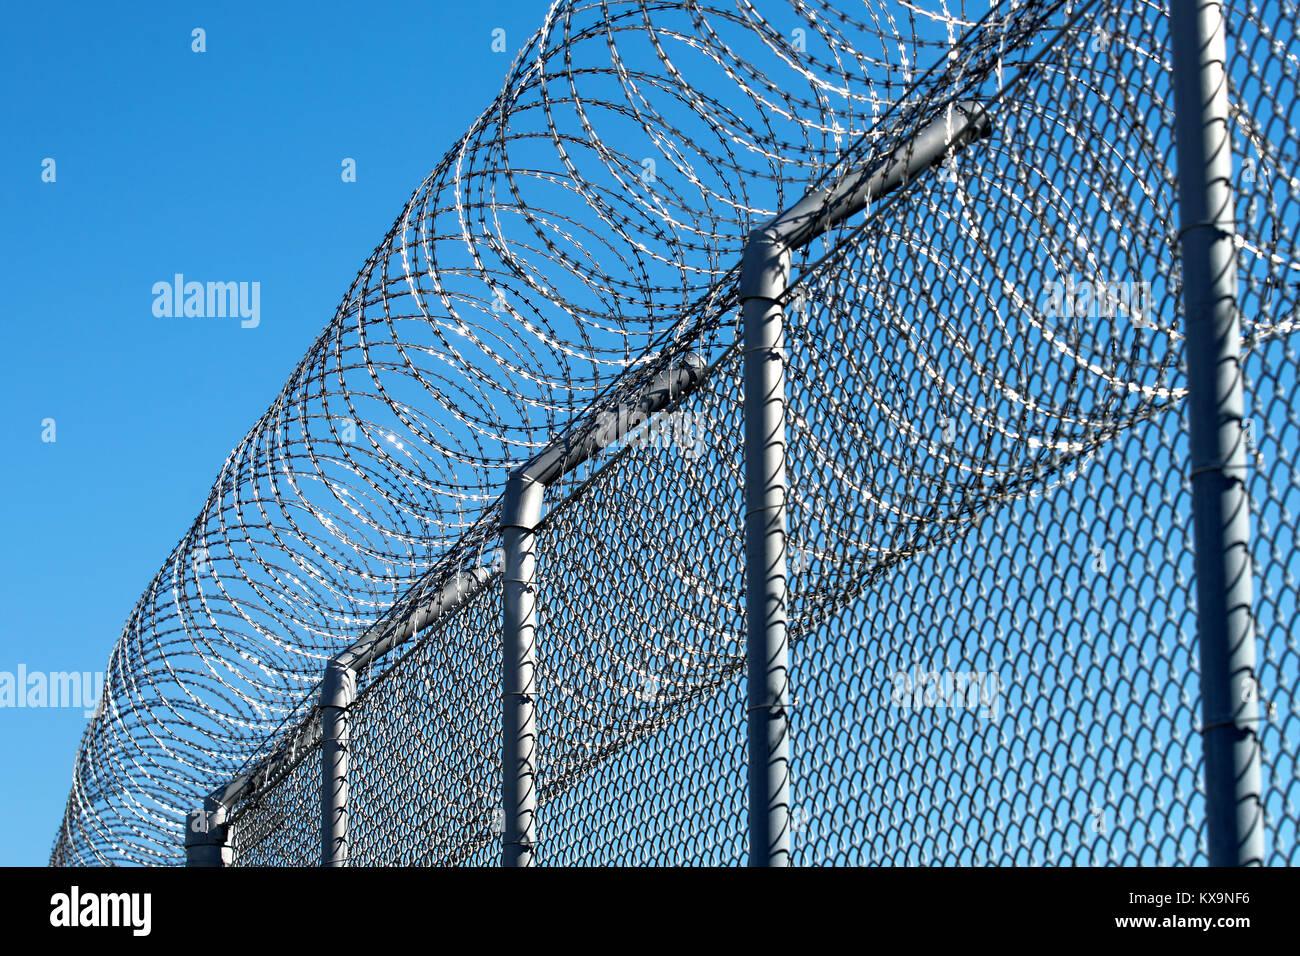 Prison razor wire fence.Credit:Mario Beauregard/Alamy Live News ...